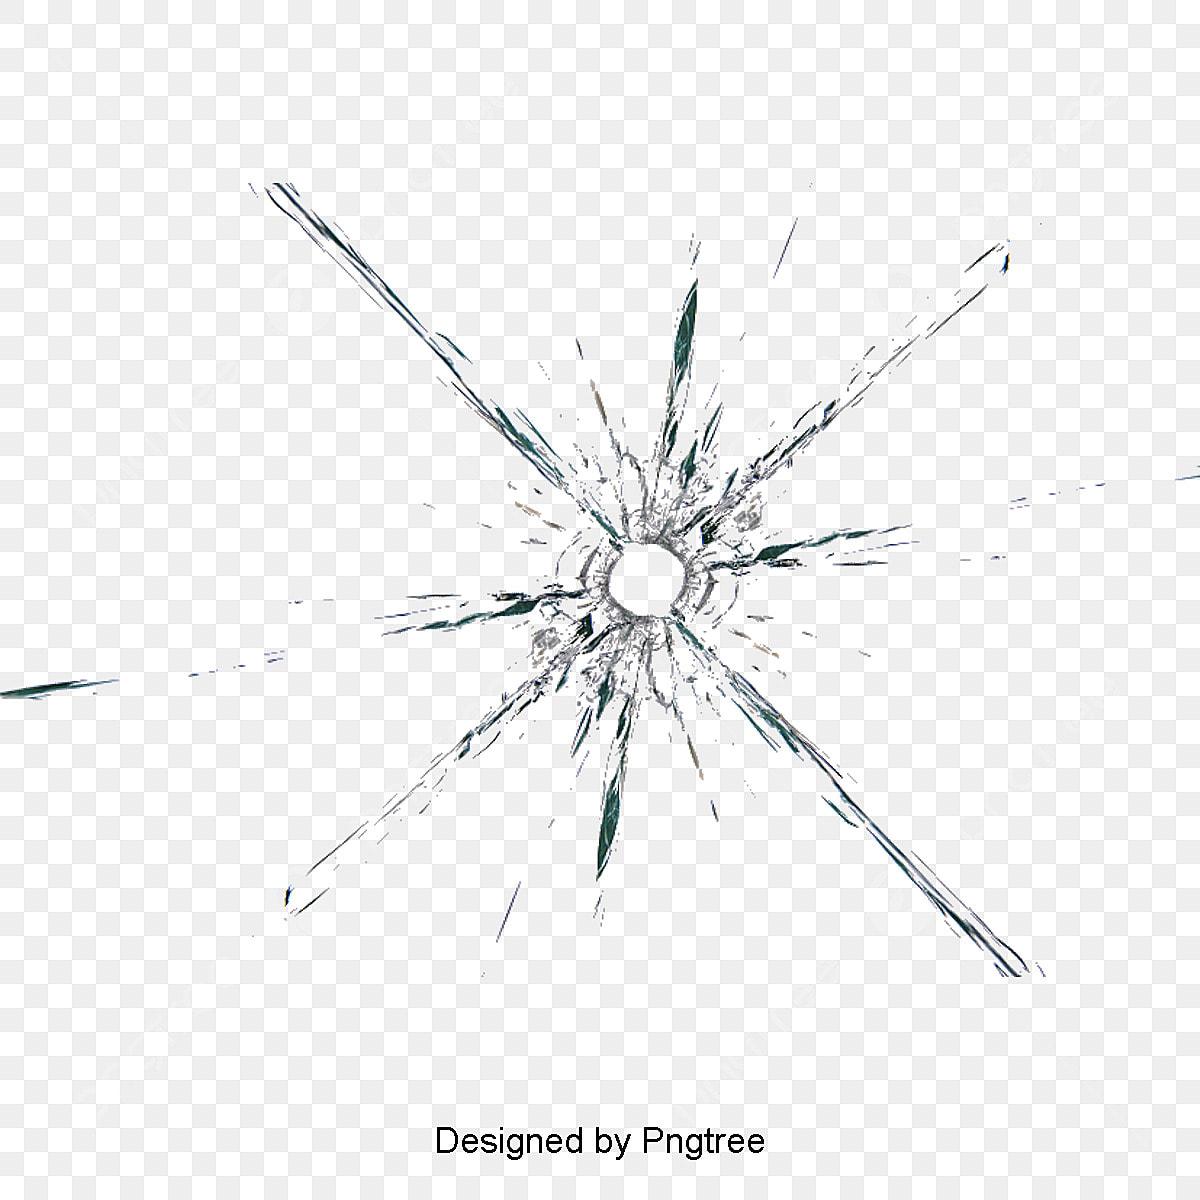 Broken Glass Broken Crack Glass Png Transparent Clipart Image And Psd File For Free Download Broken glass, 27 transparent png images. https pngtree com freepng broken glass 397771 html